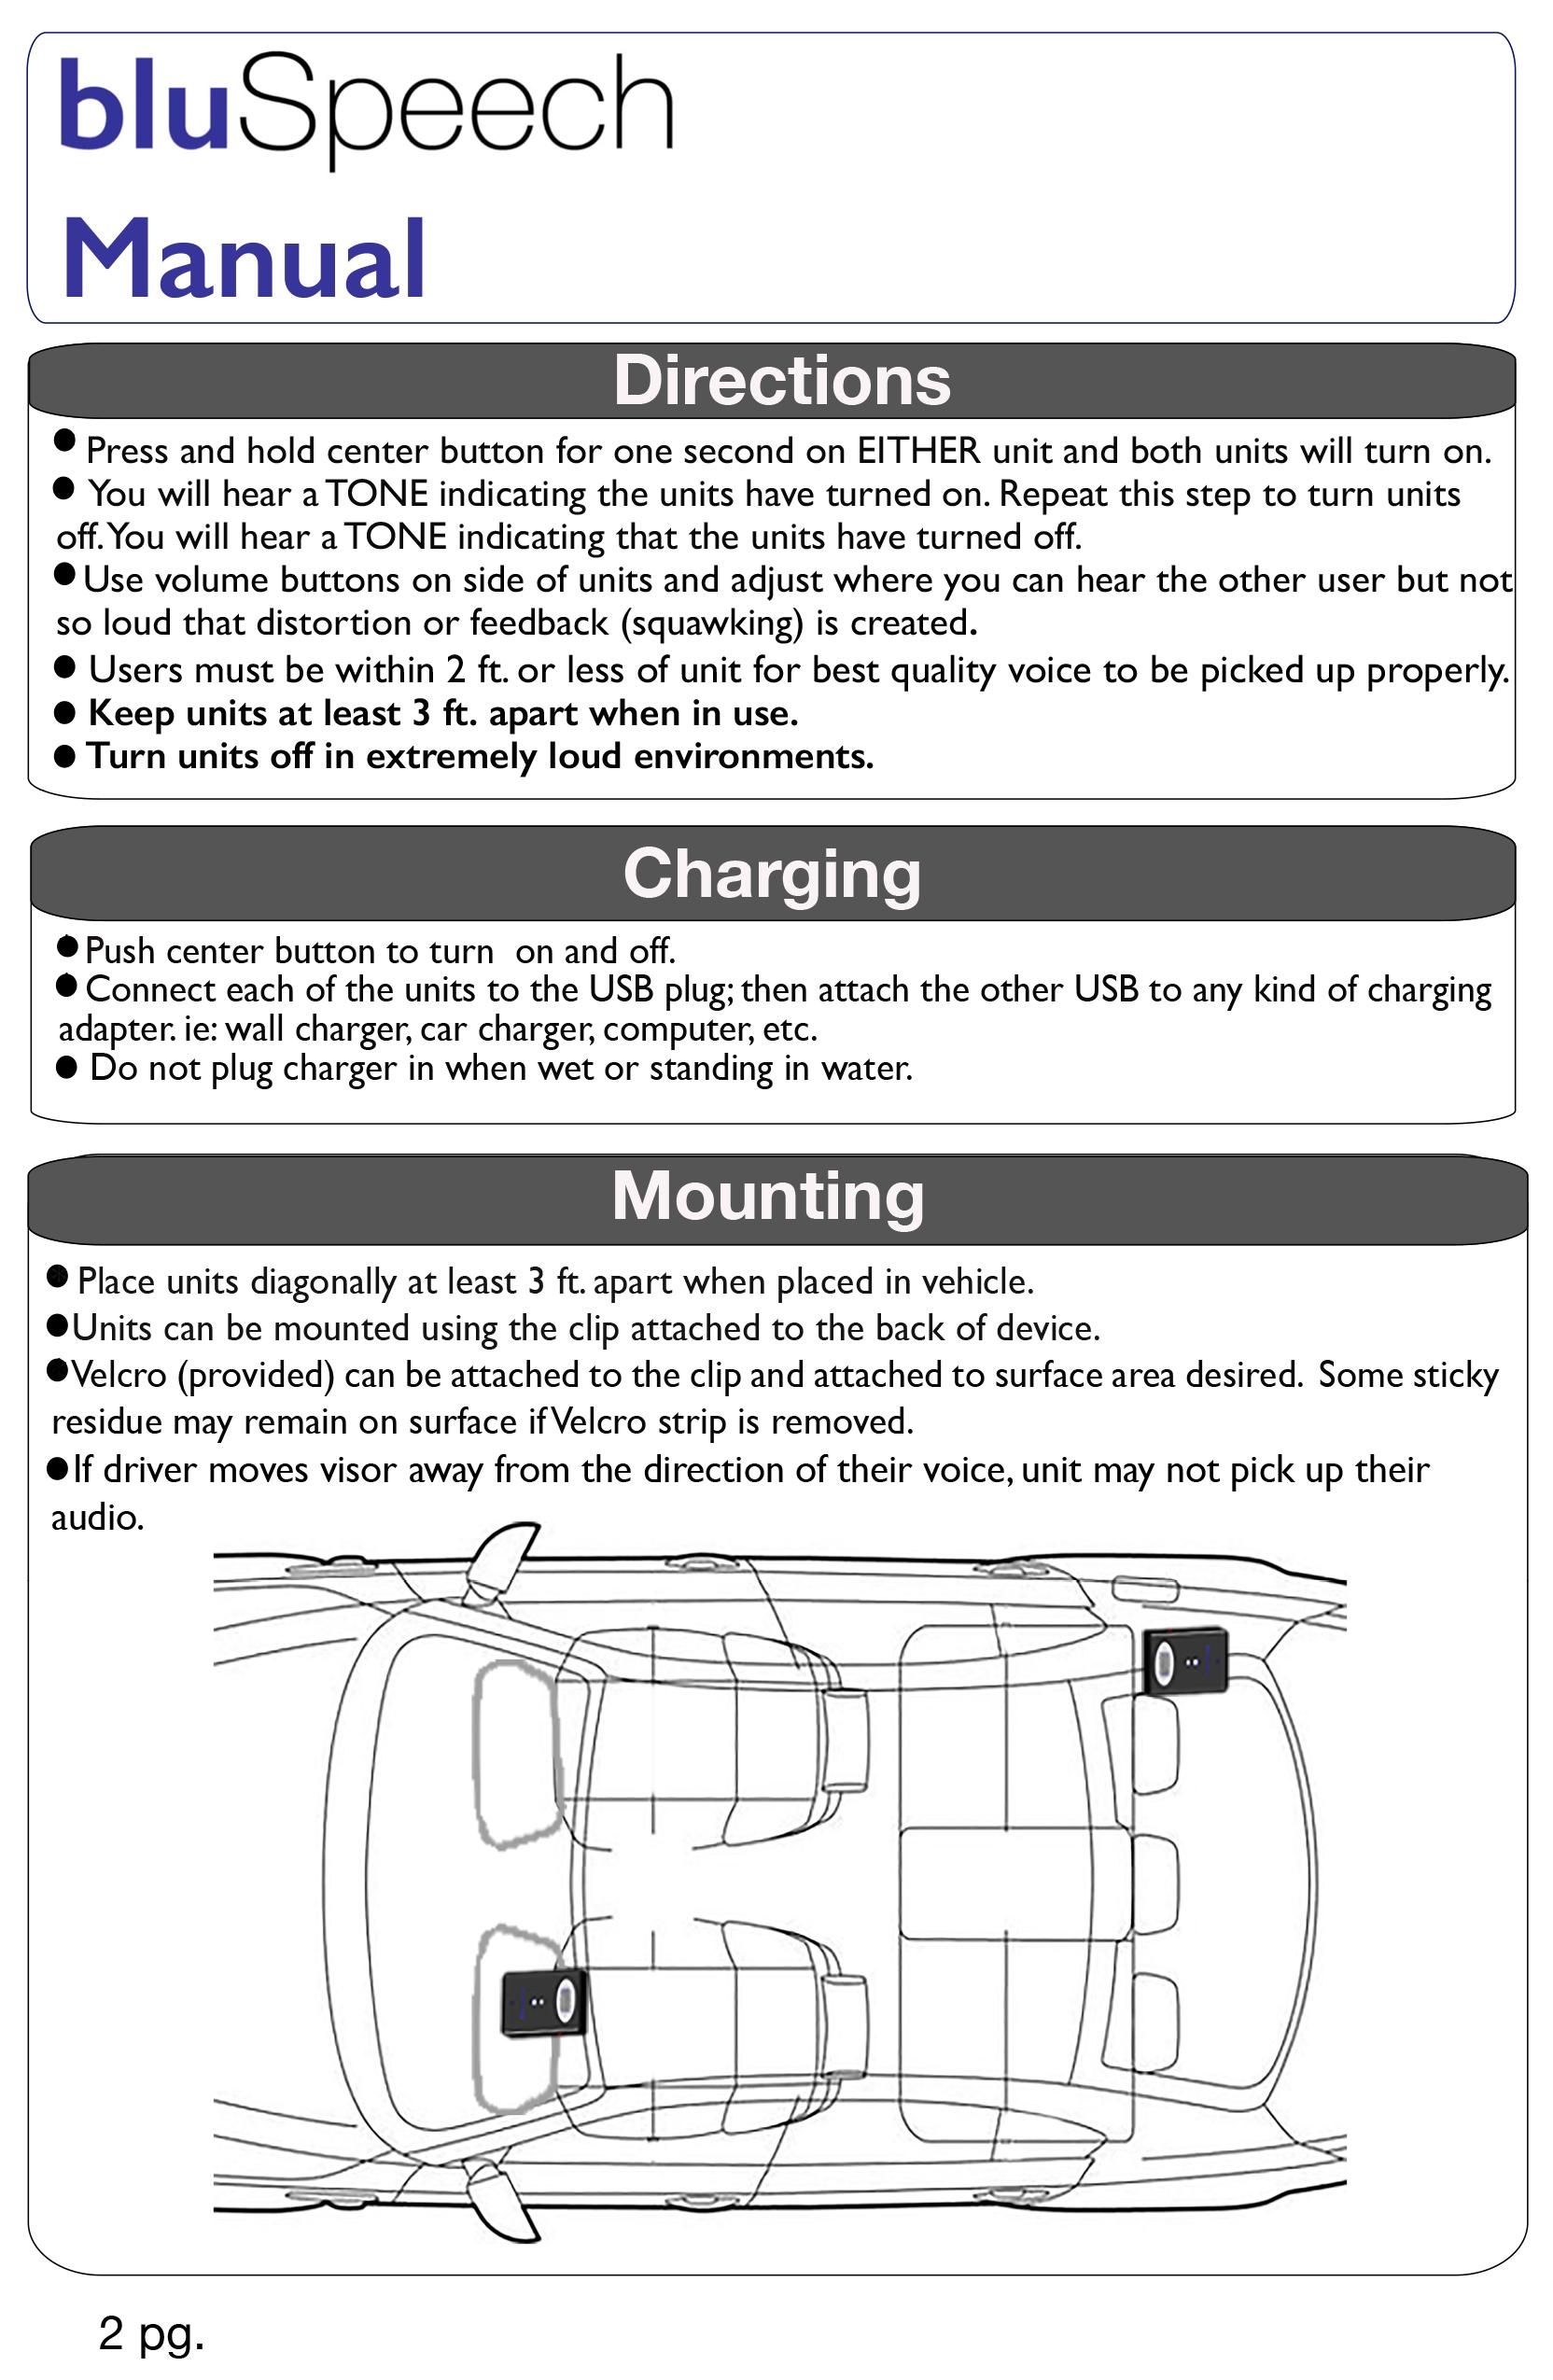 Manual PG 2.jpg